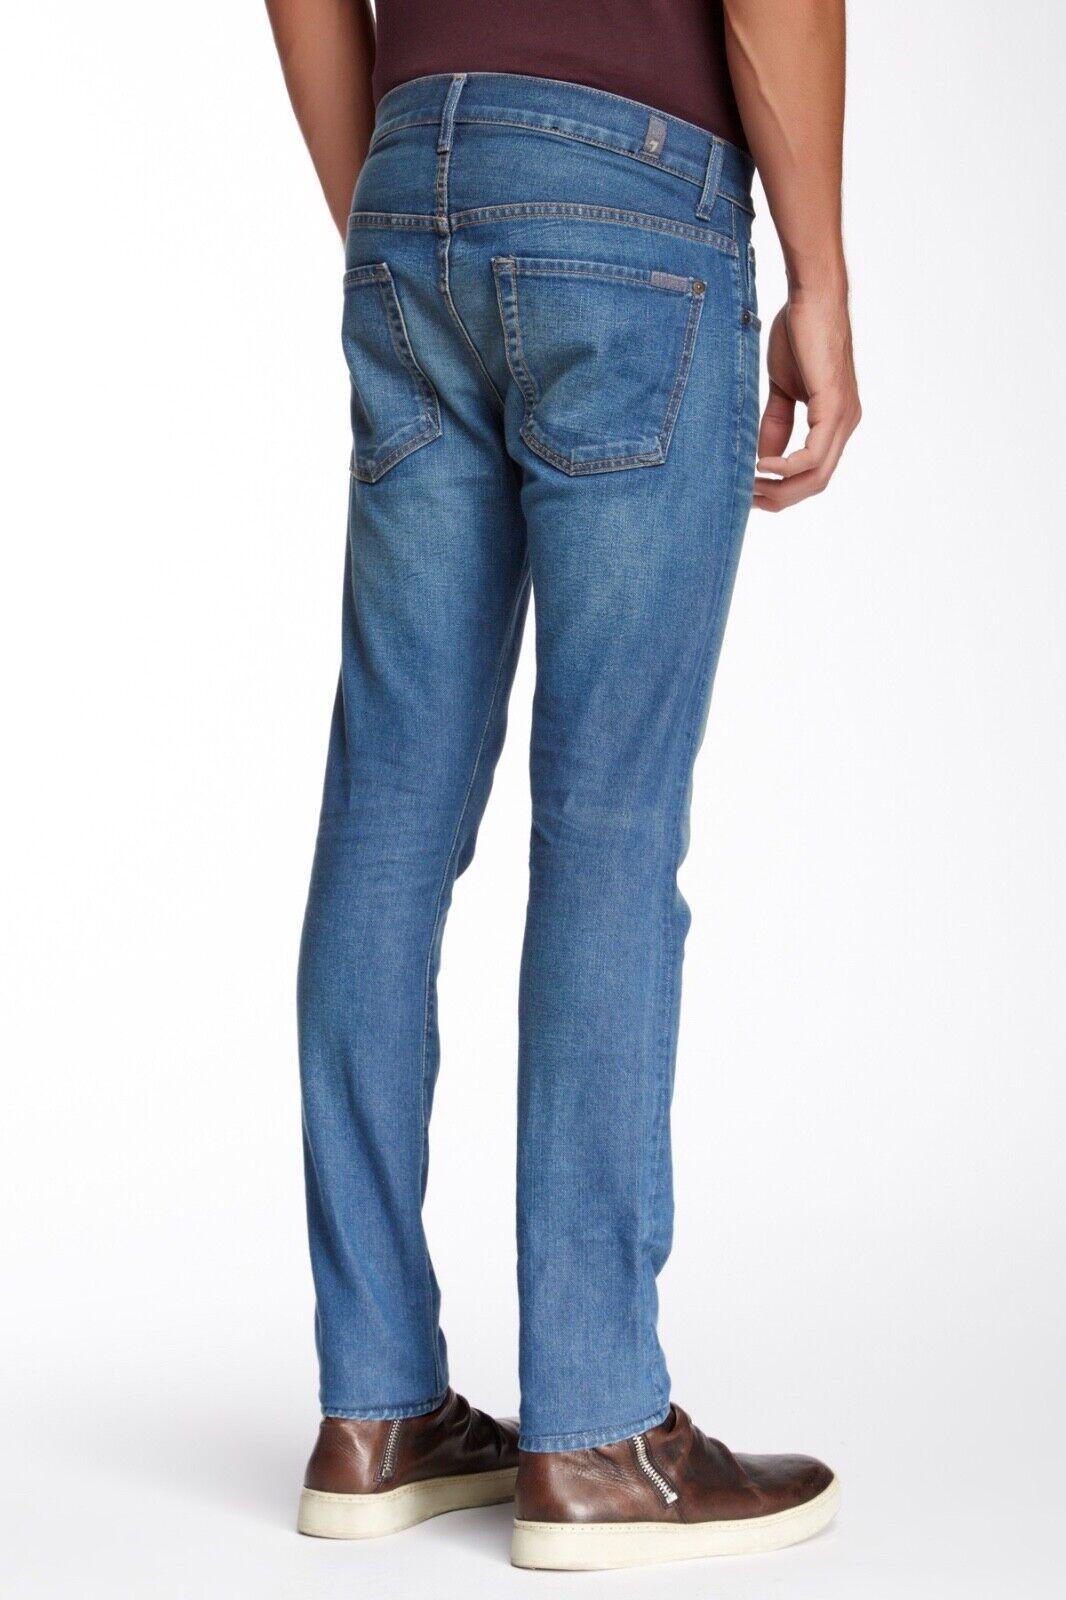 7 Seven For All Mankind Jeans Paxtyn Slim Skinny Okayama Trail bluee sz 36